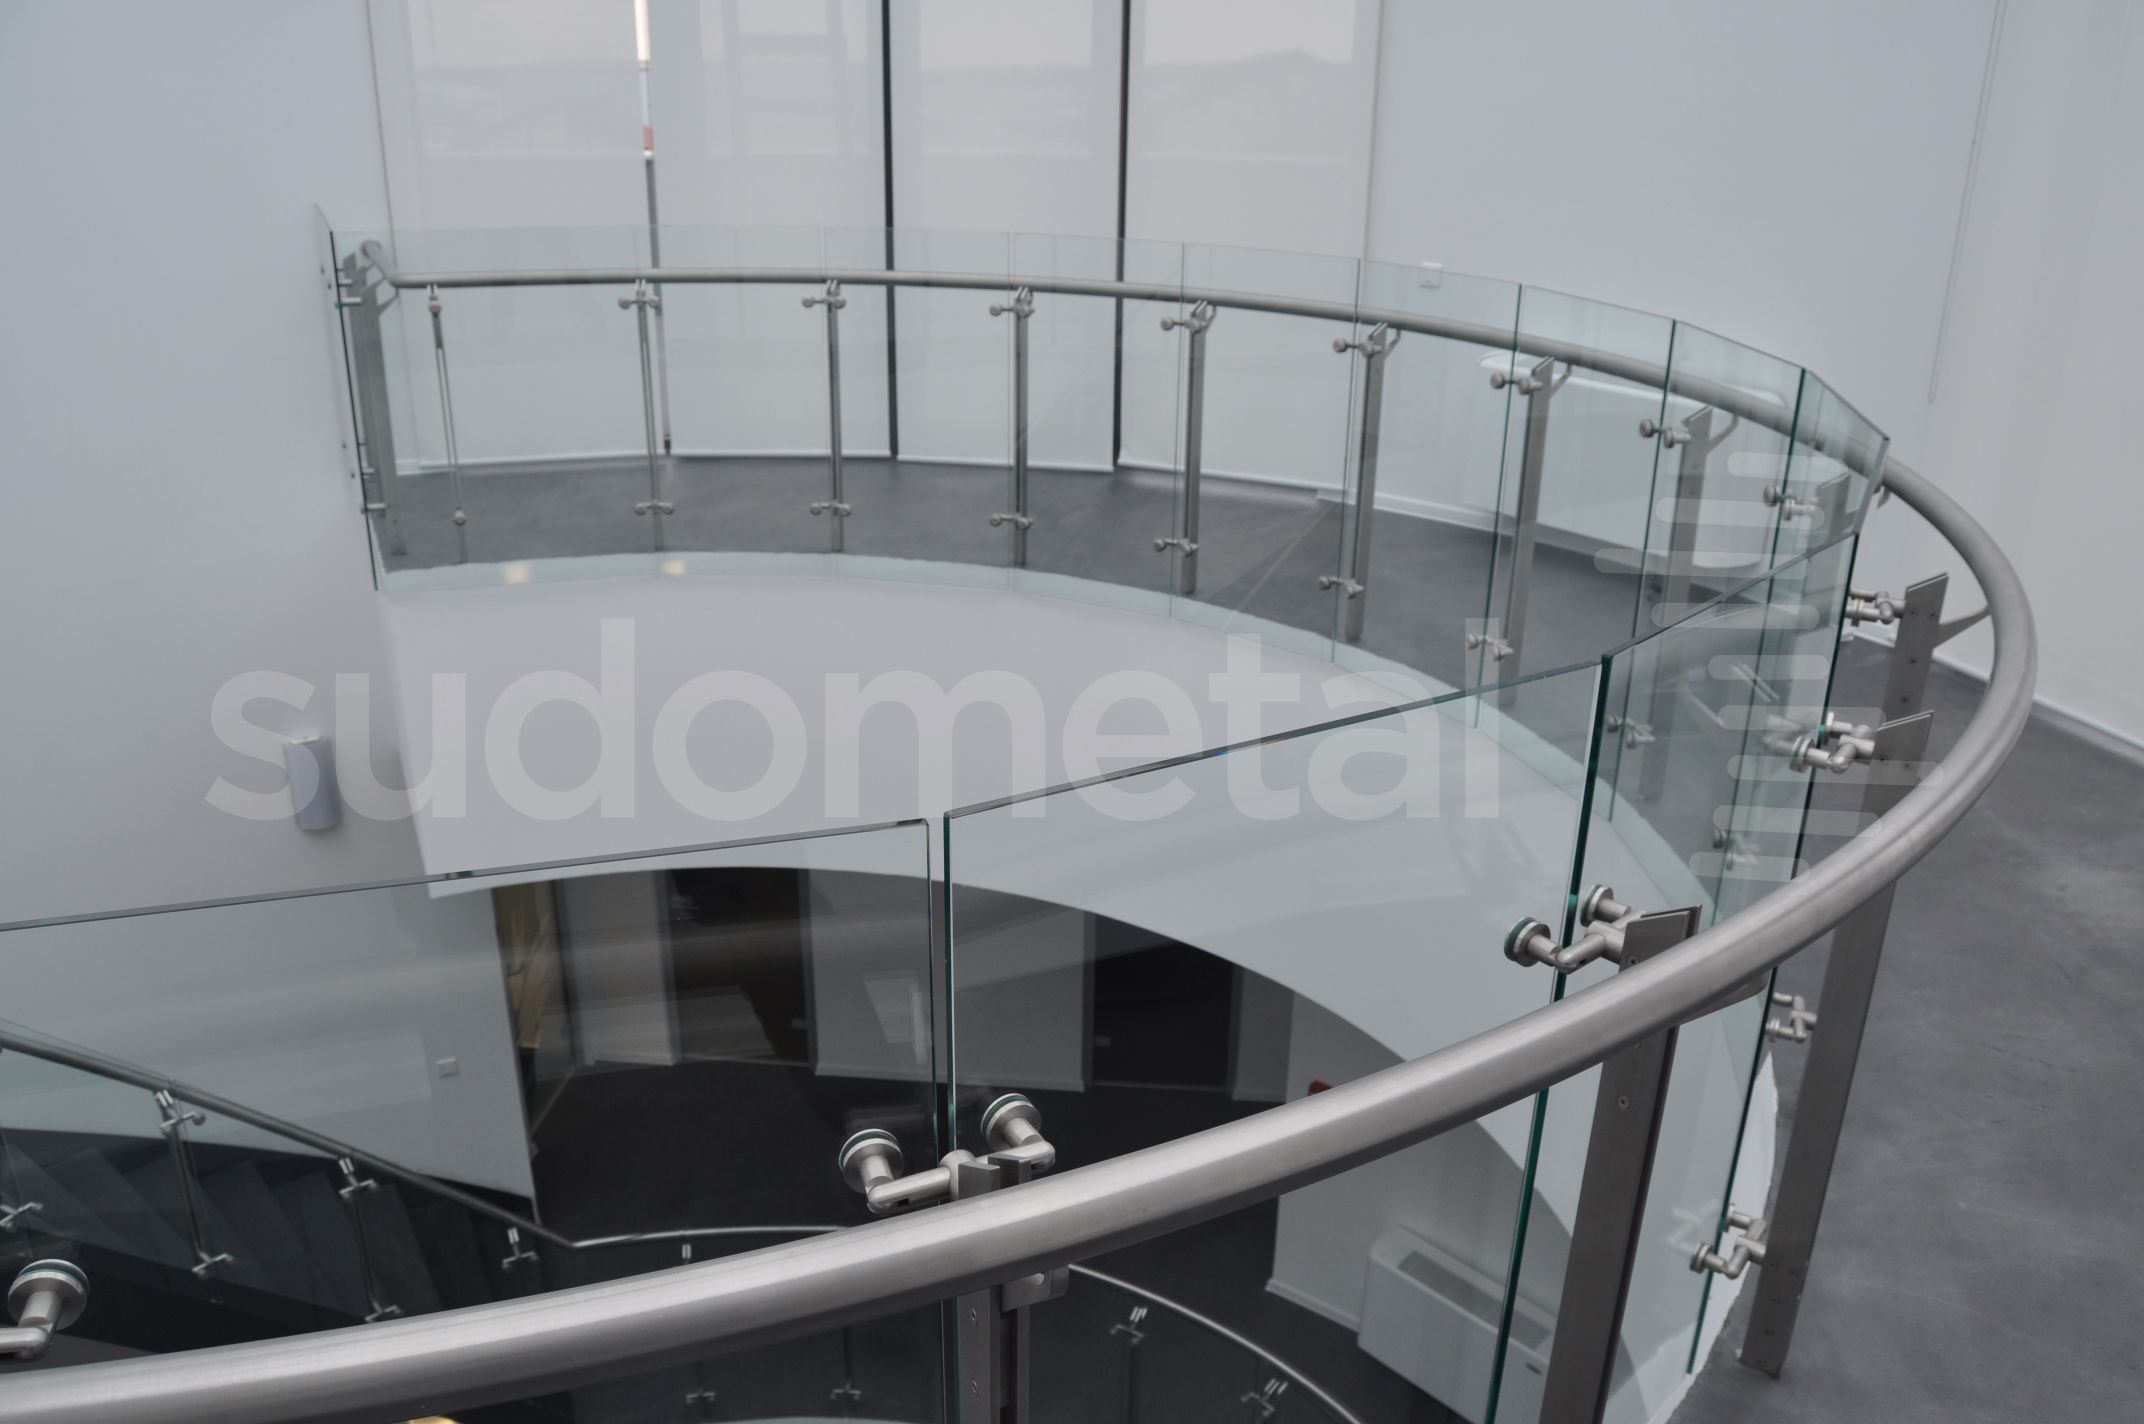 Balustrade din inox-sticla - Balustrade sediu companie SECOM SUDOMETAL - Poza 5